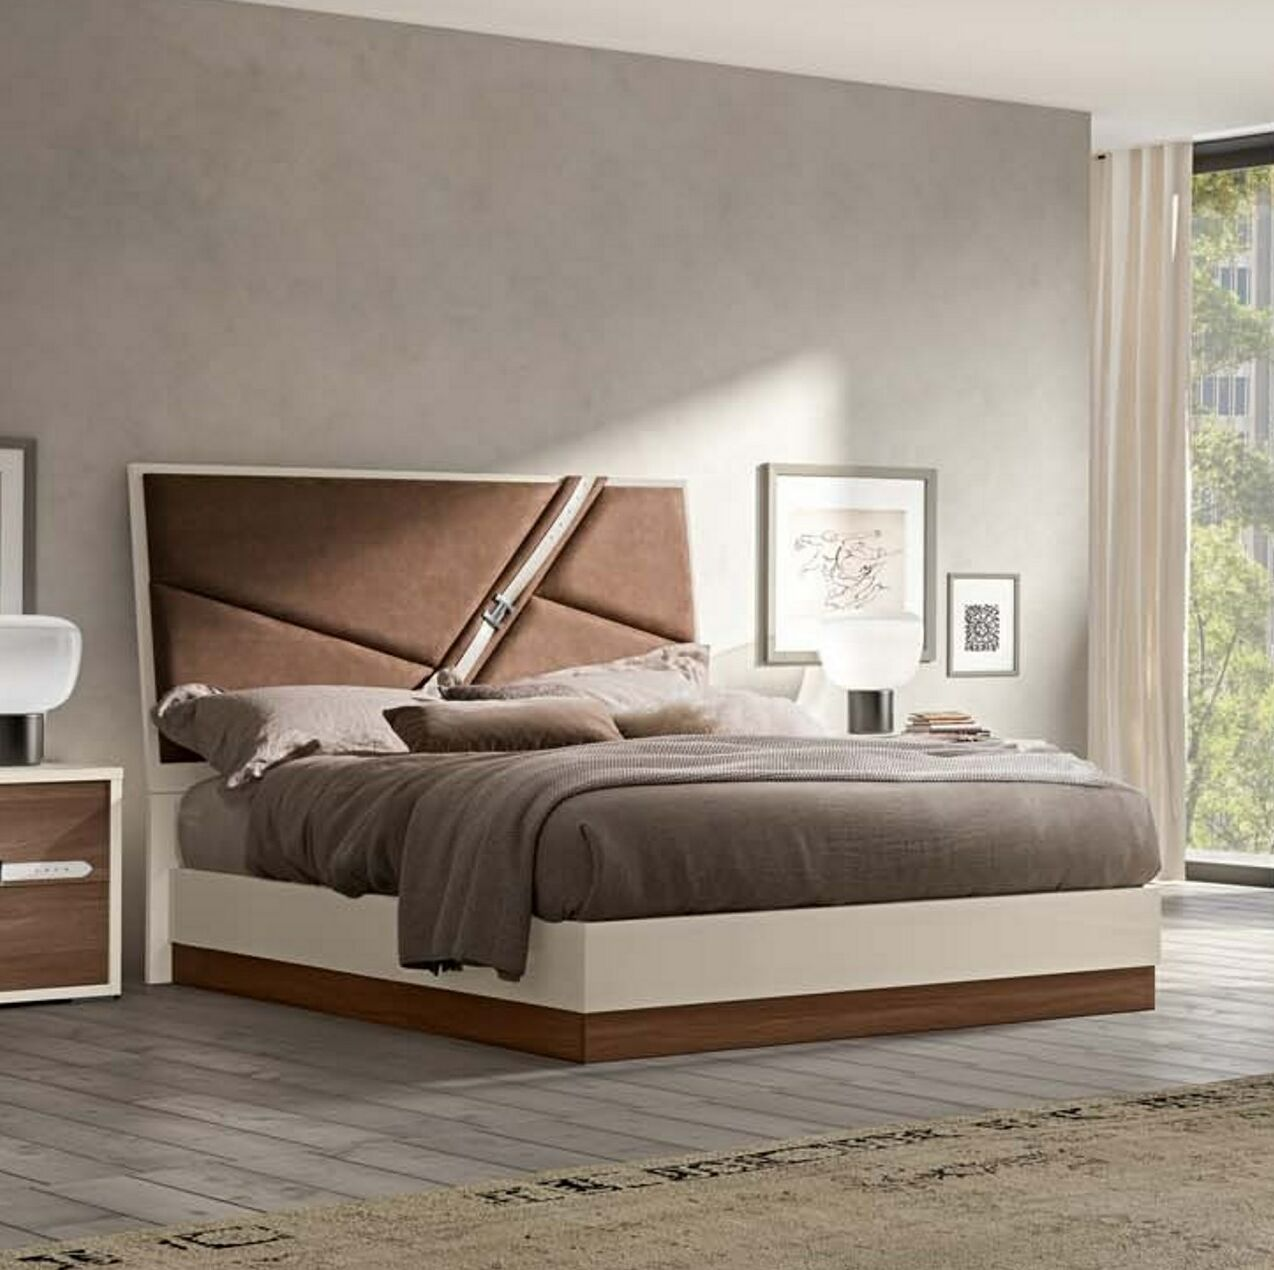 Sunnydale Upholstered Panel Bed Size: King